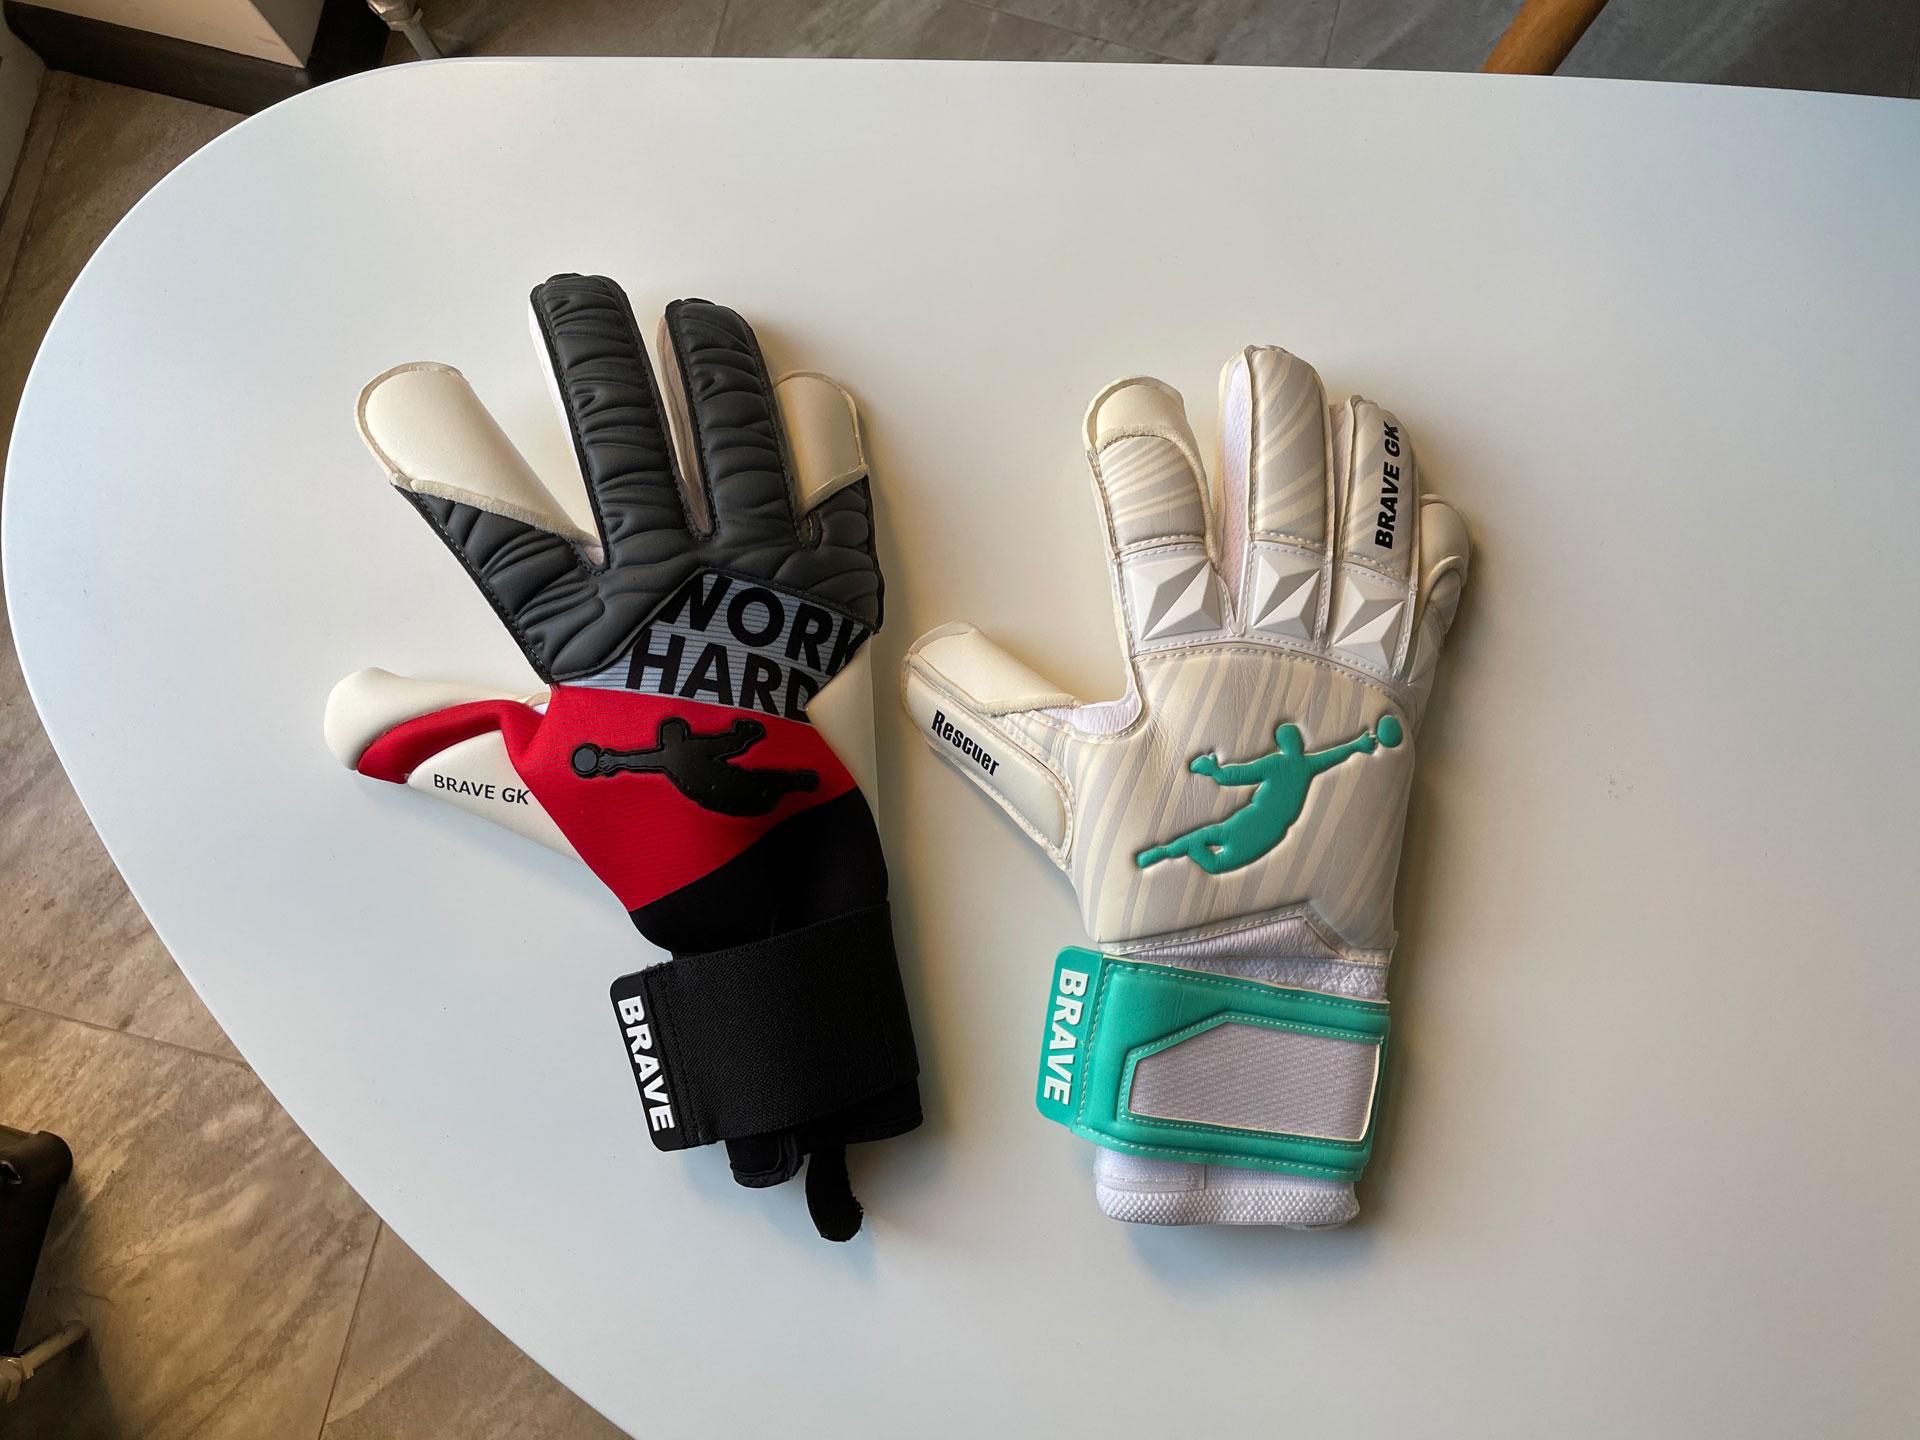 Воротарські рукавиці Brave GK Rescuer - офіційний інтернет-магазин Brave GK